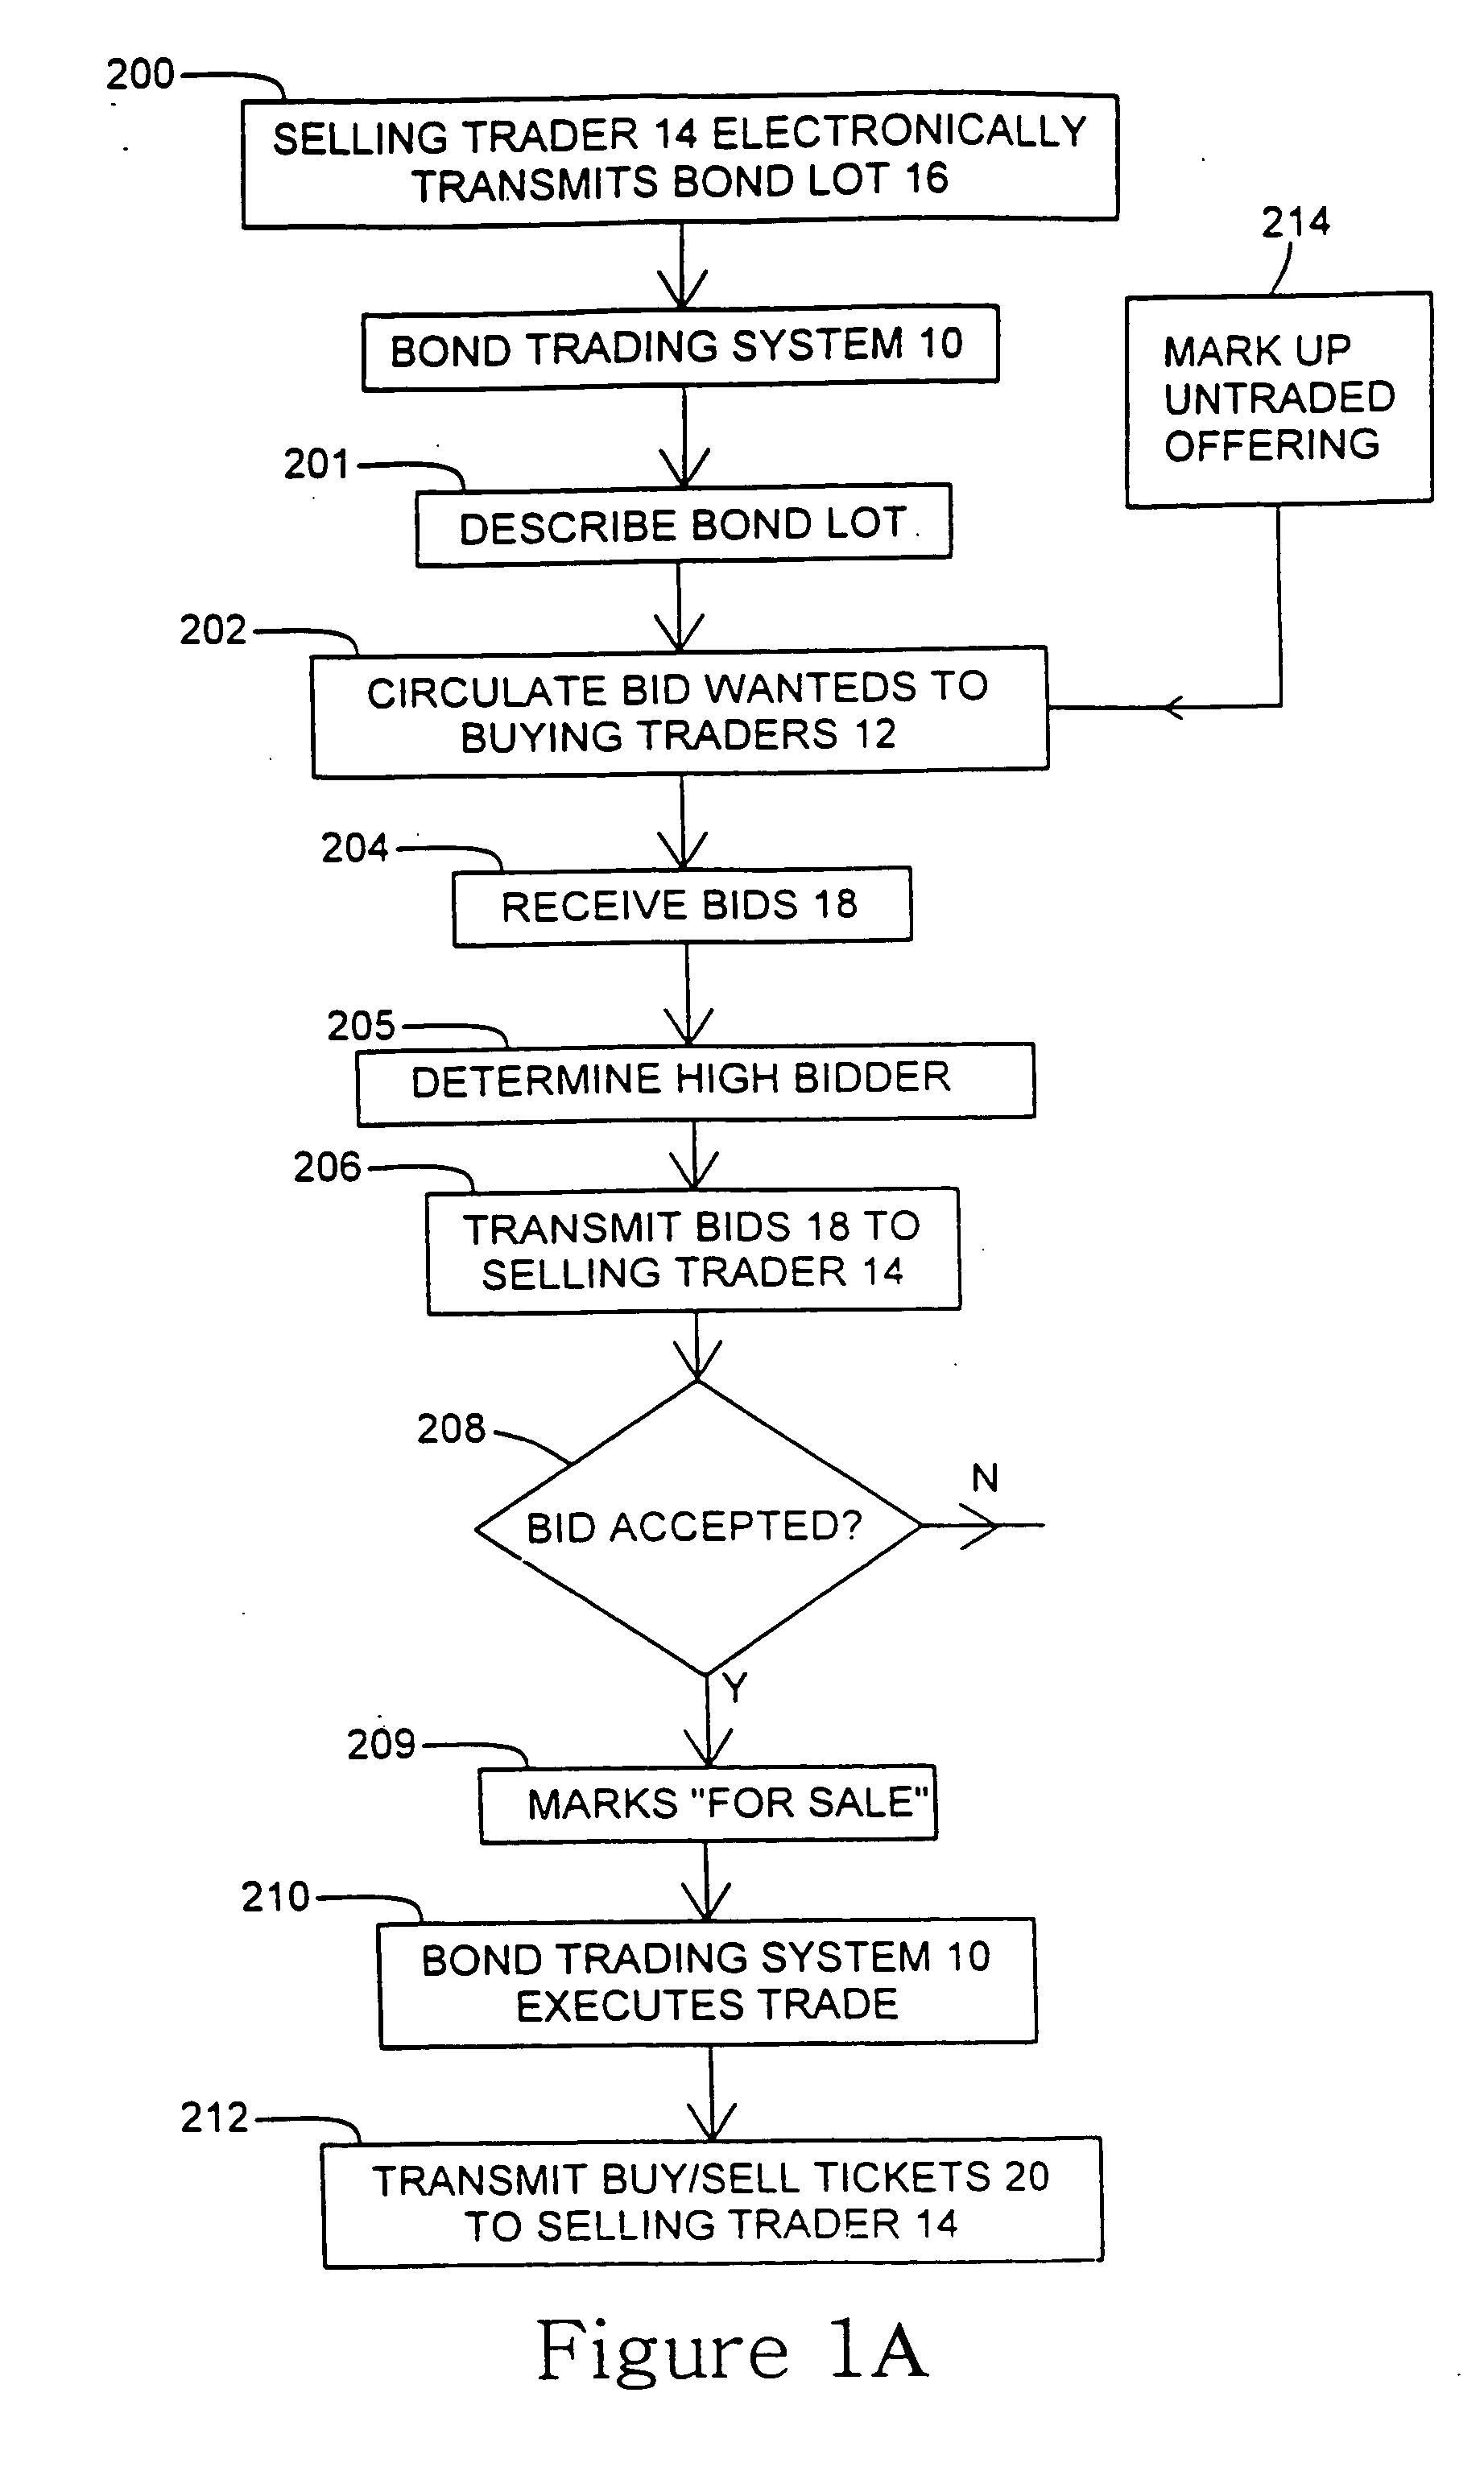 Aladdin bond trading system